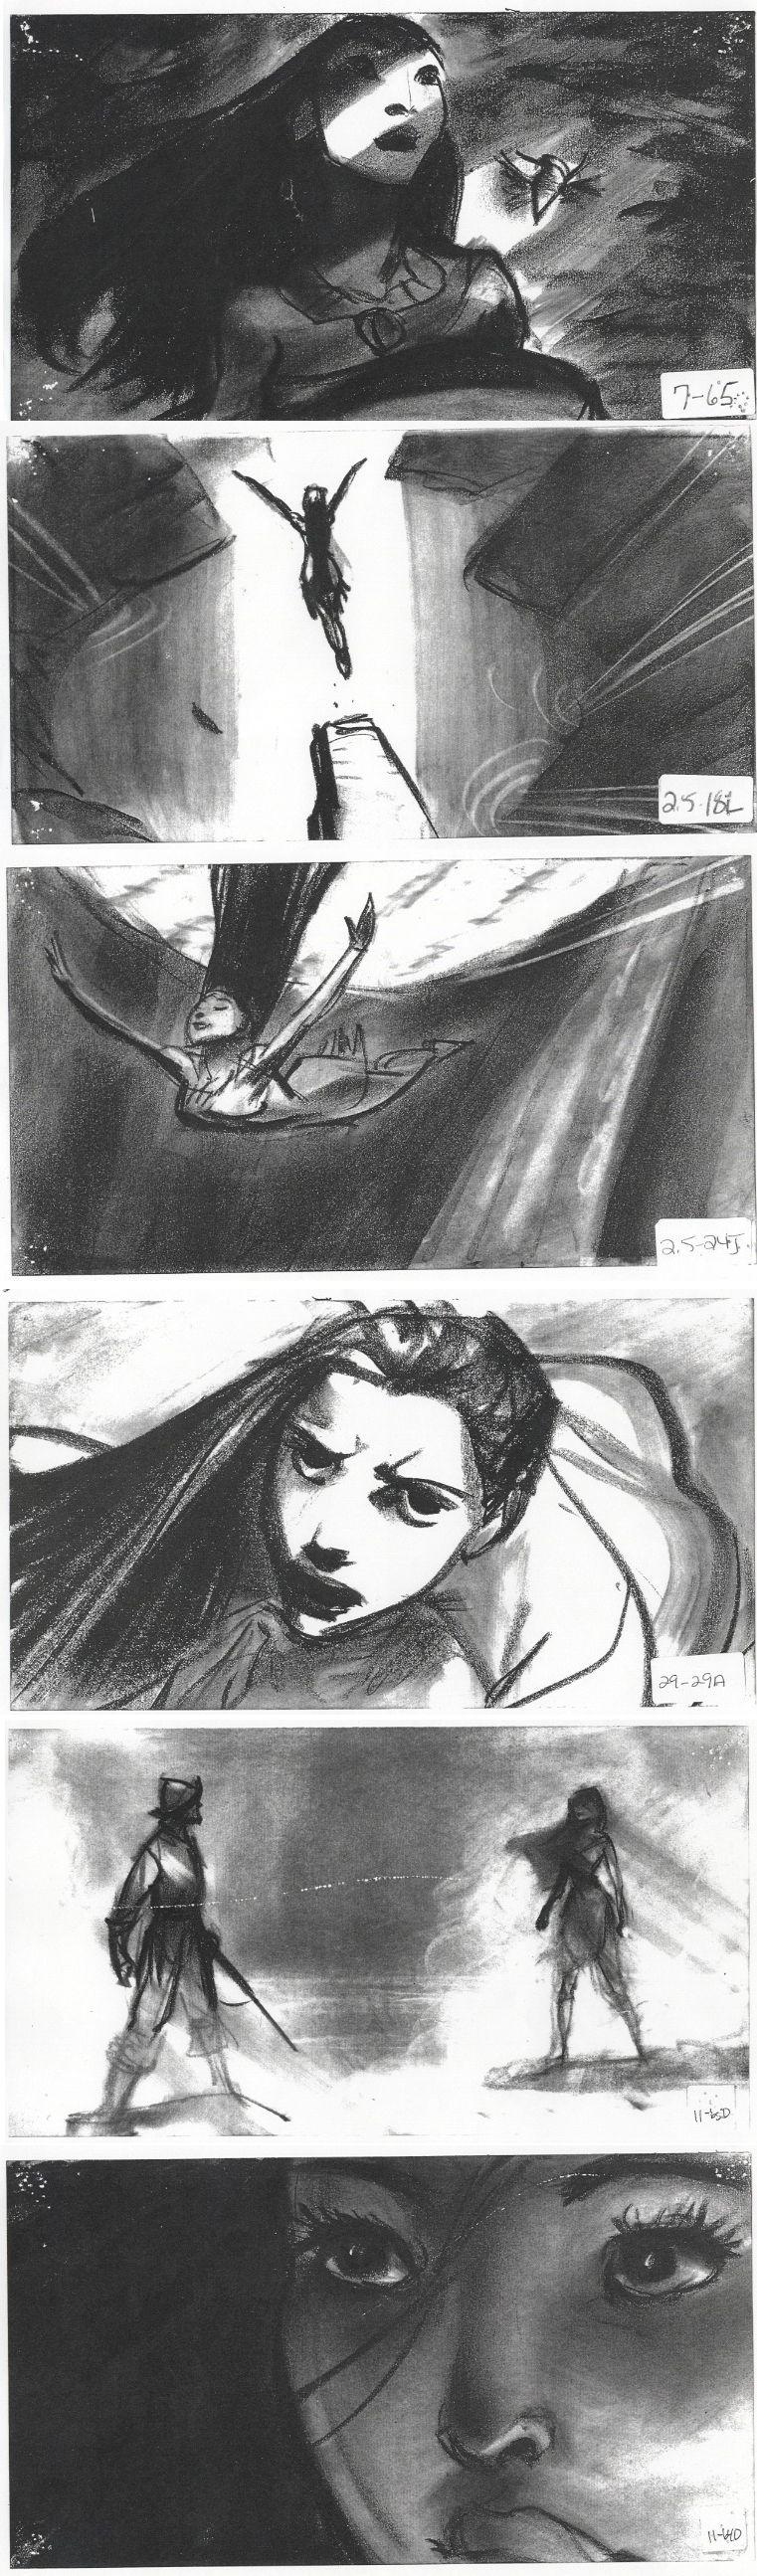 Pocahontas, une Légende Indienne [Walt Disney - 1995] - Page 13 70ba953092b1cf6514122a1ee00080c8